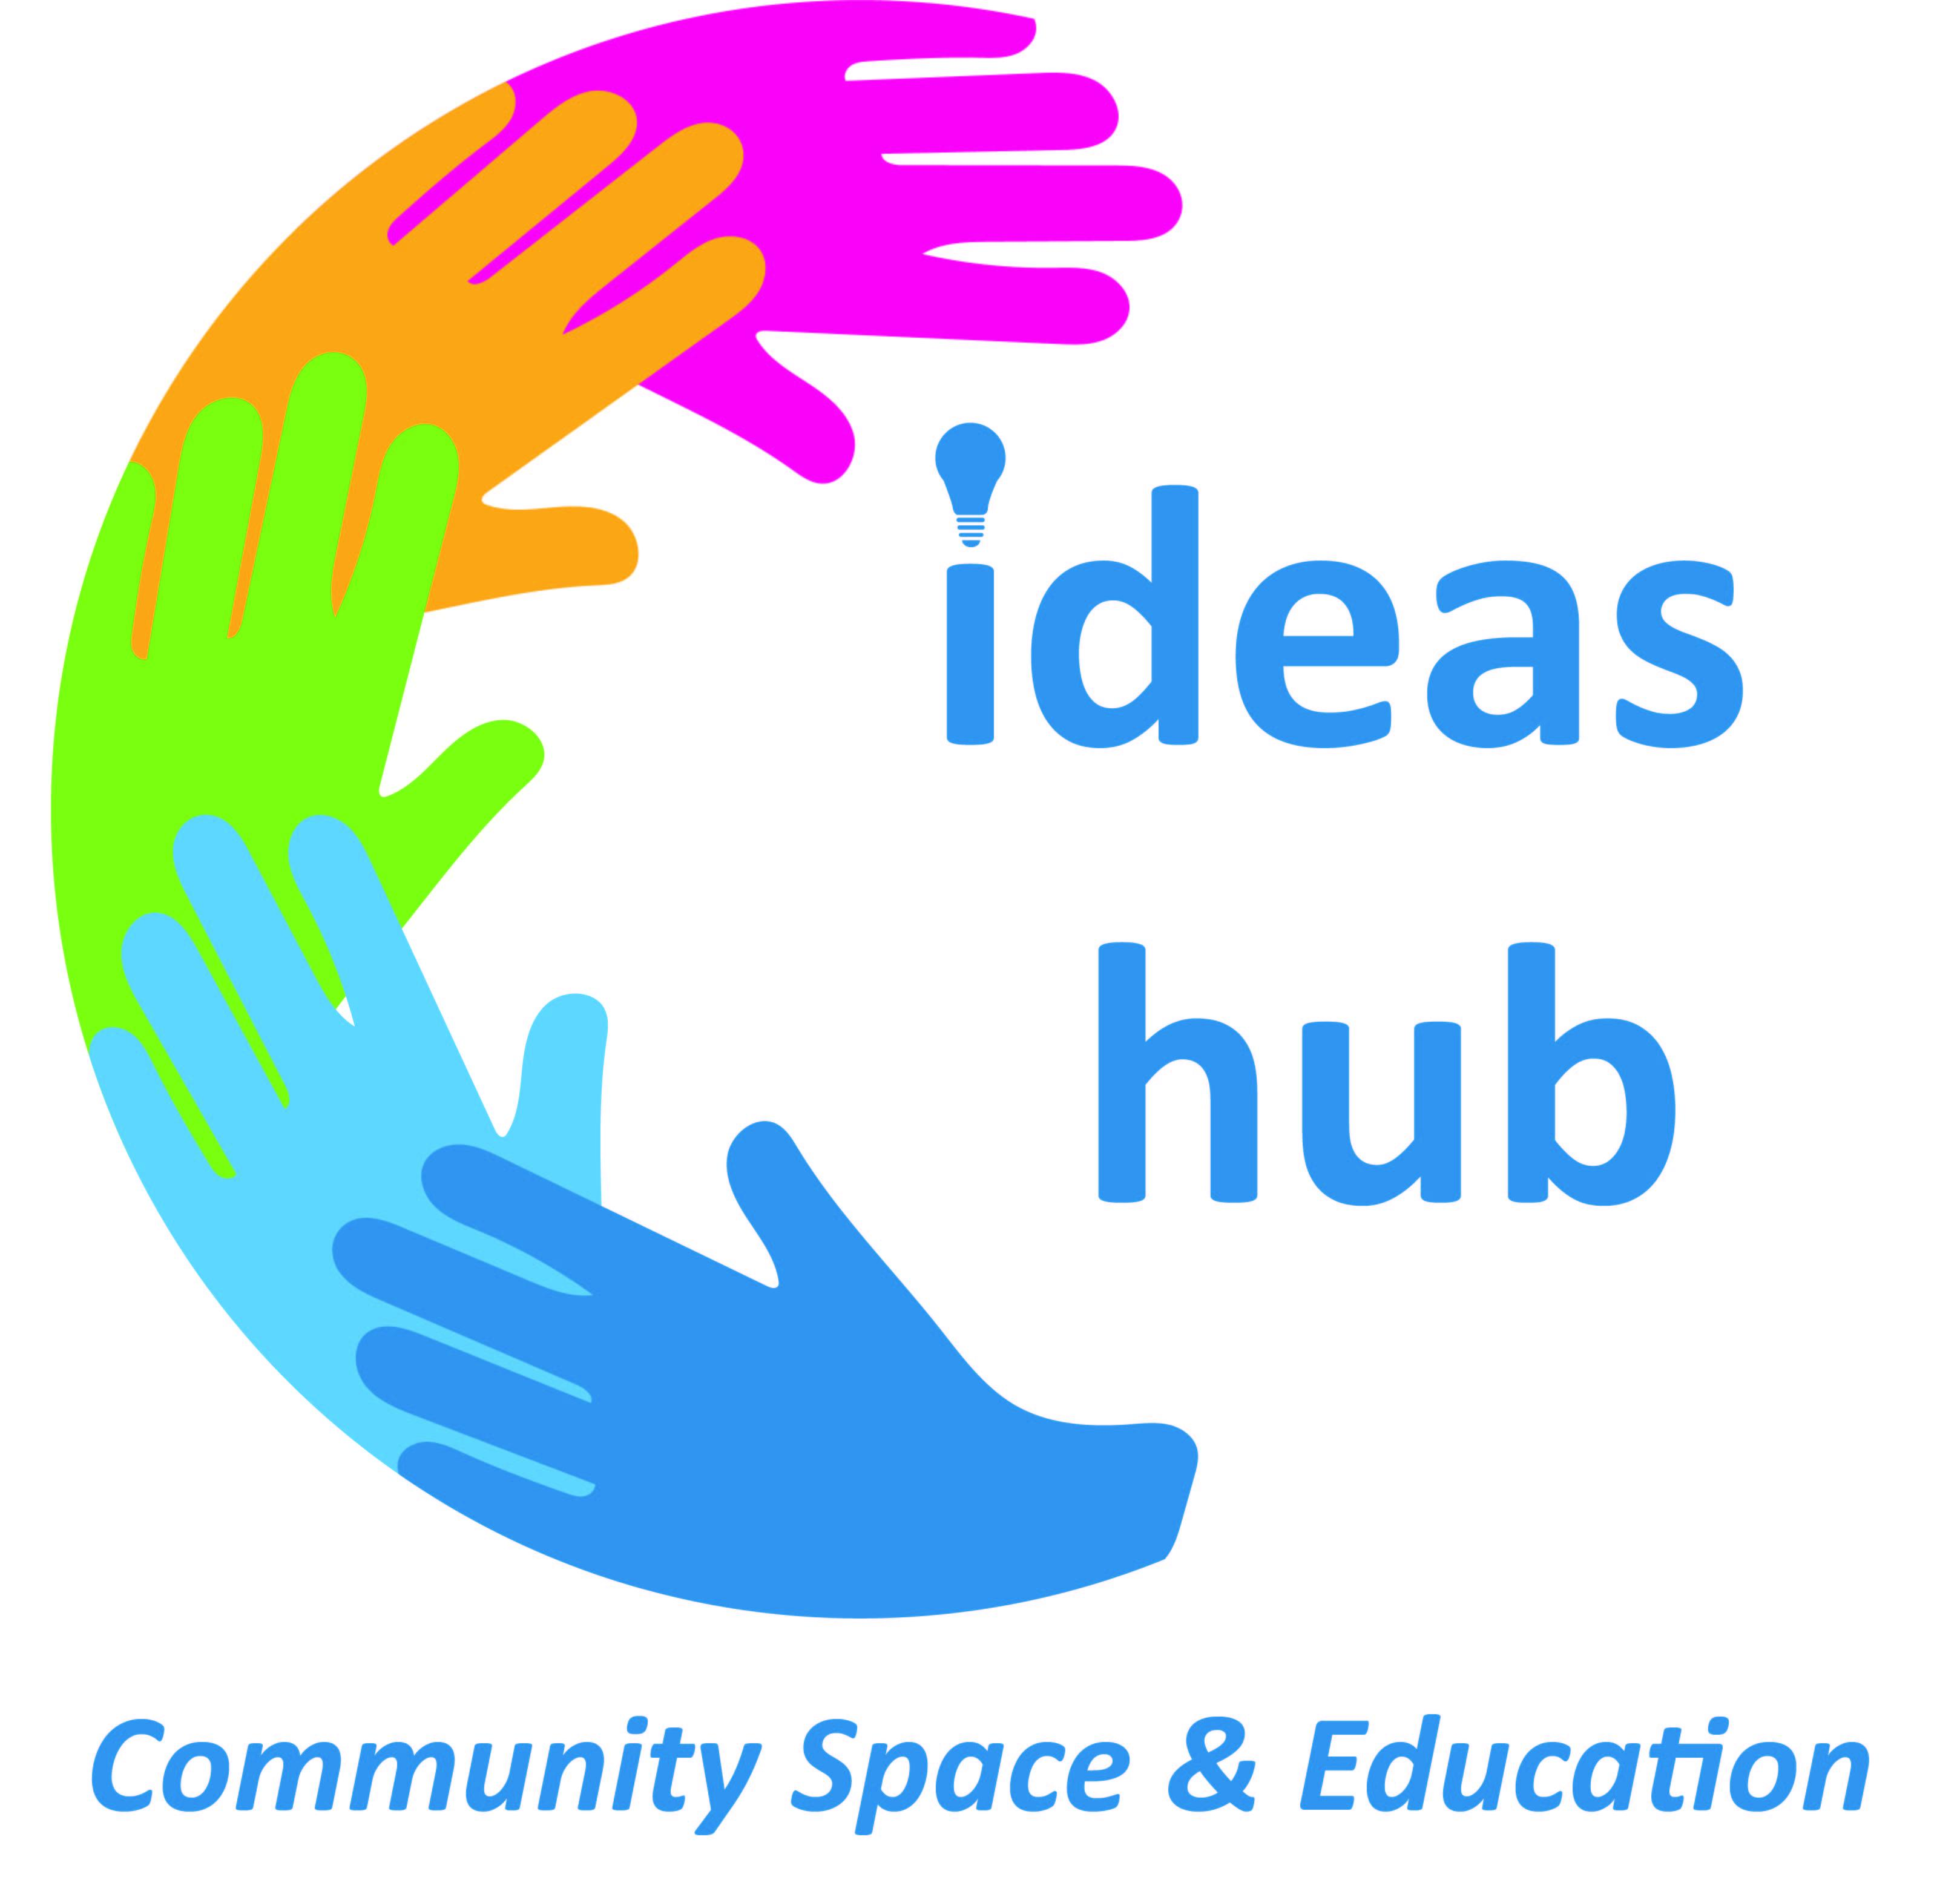 Ideas Hub - 2020/21 impact assessment